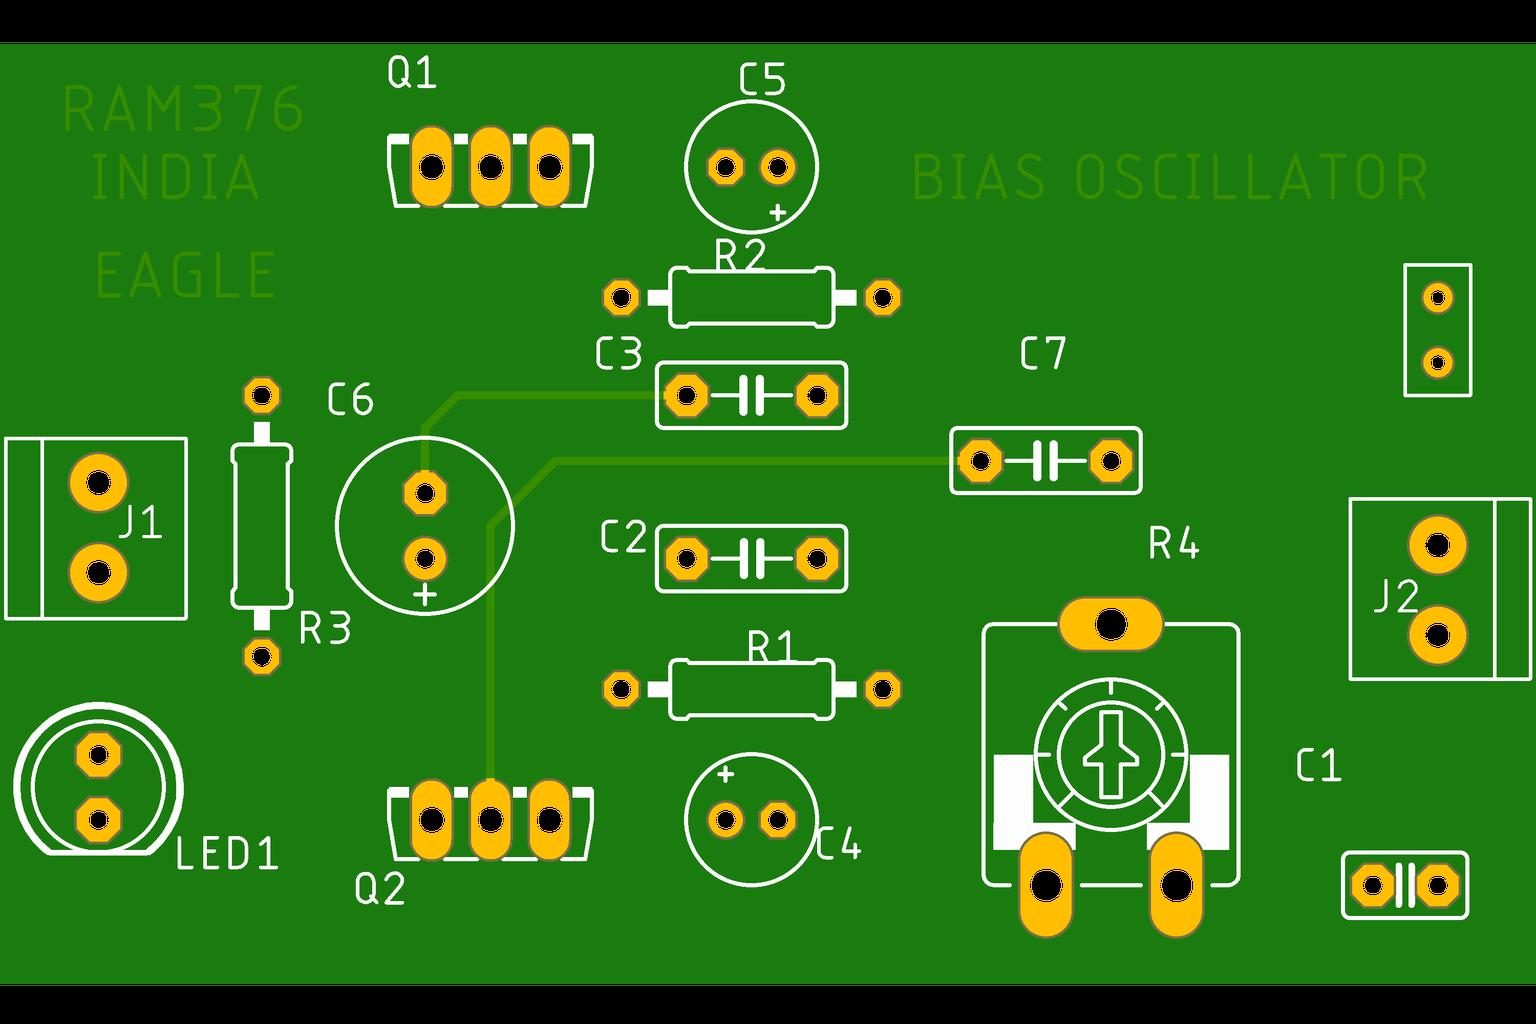 Images of Printed Circuit Board (PCB)